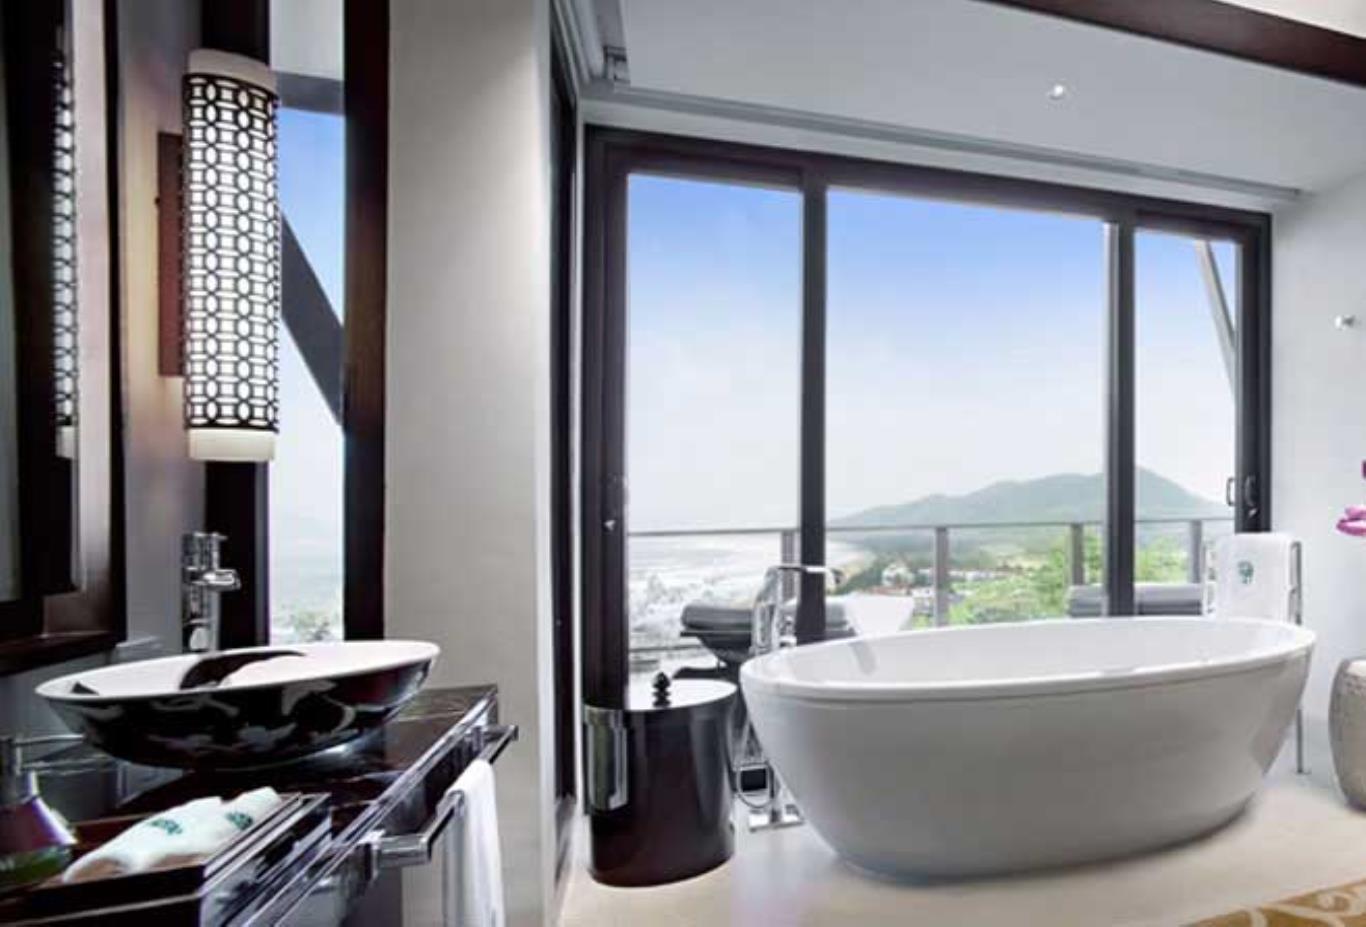 HillsidePoolVilla-2-bed-bath